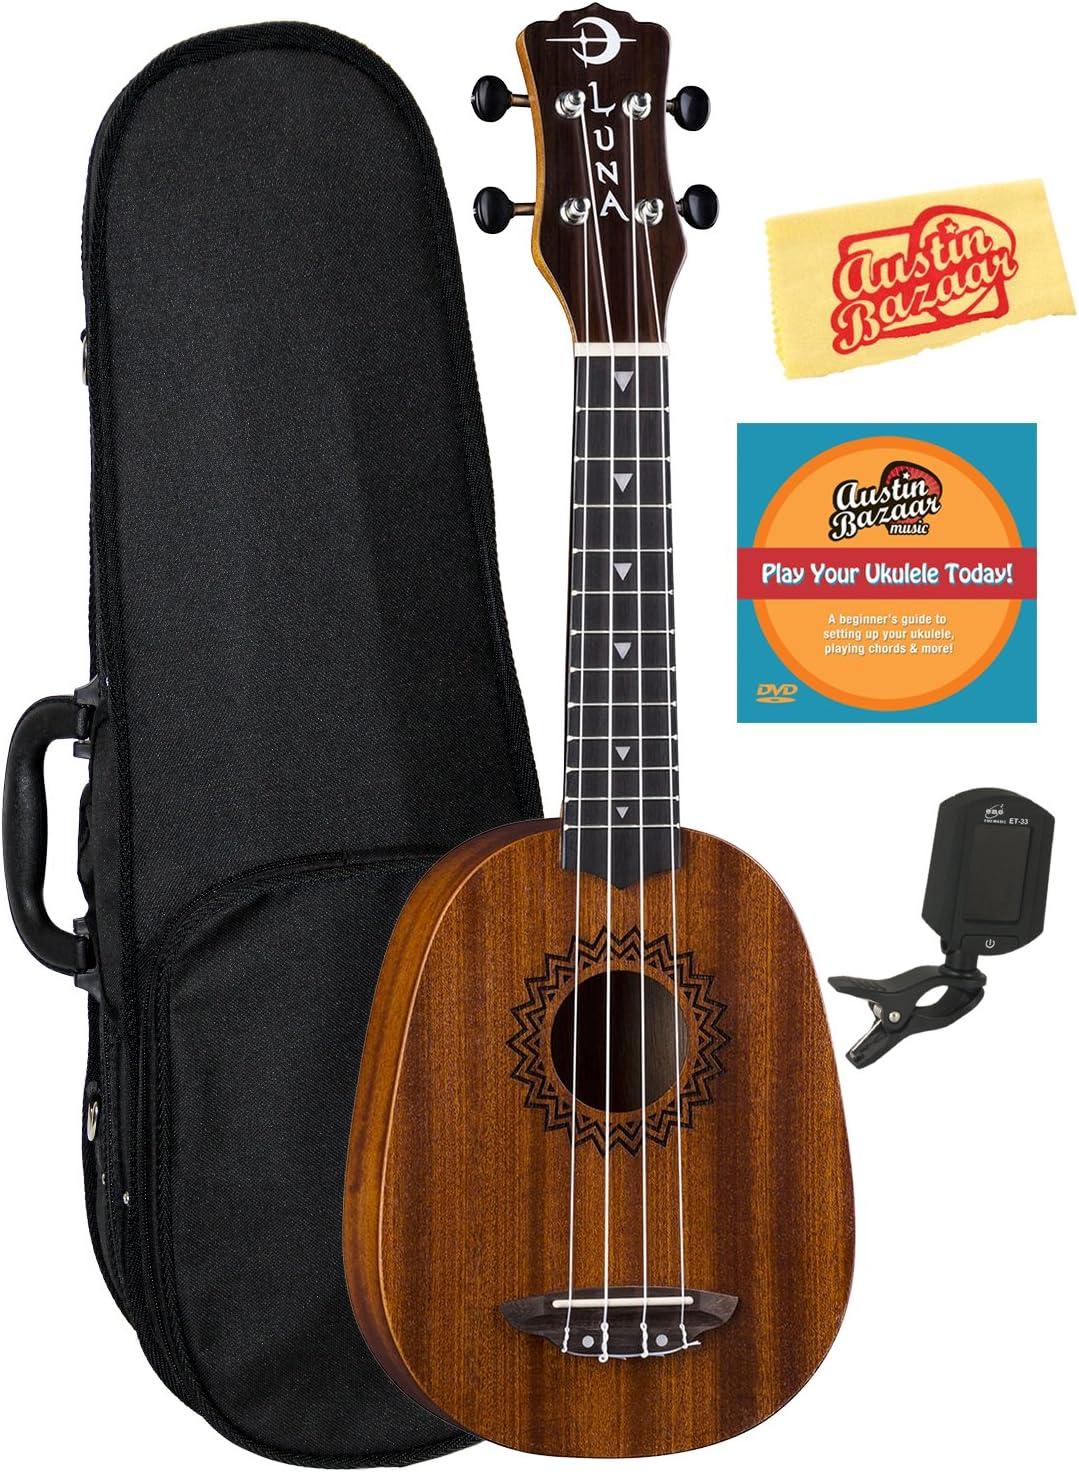 Luna Guitars Be super 2021 new welcome Vintage Mahogany Pineapple Ukulele Hard with Bundle